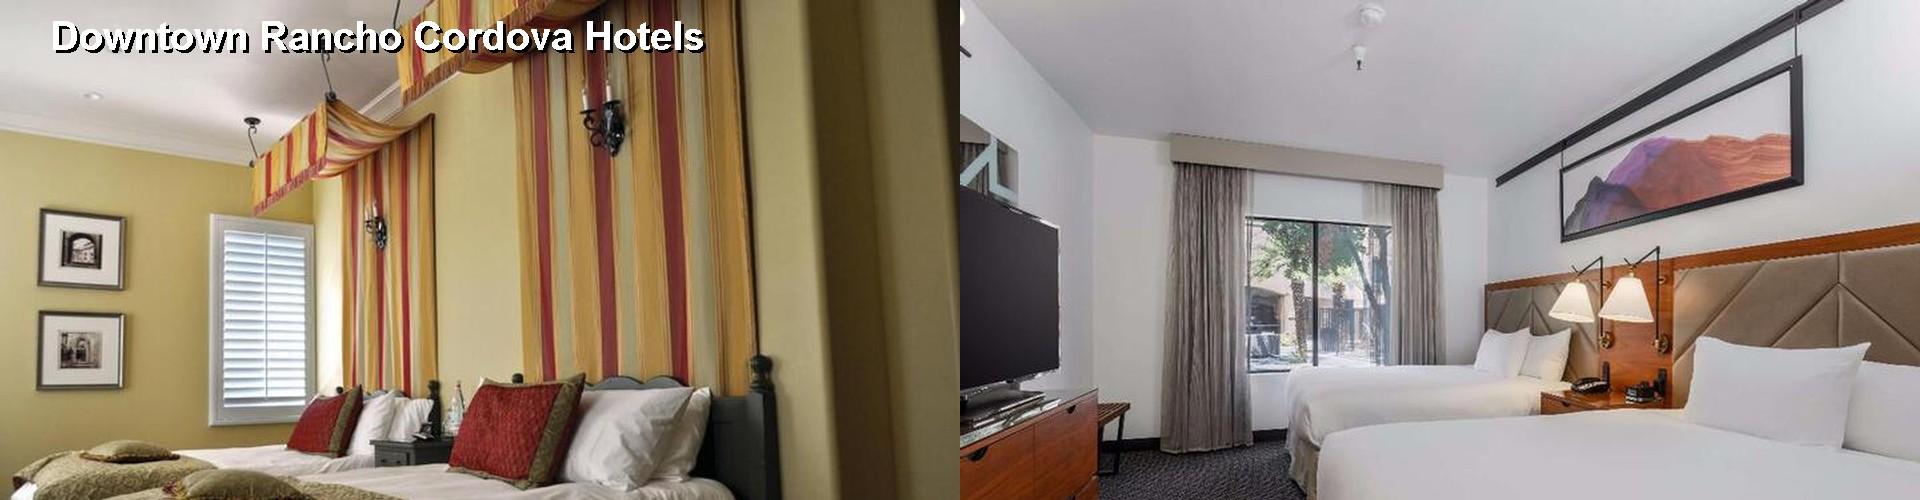 5 Best Hotels Near Downtown Rancho Cordova